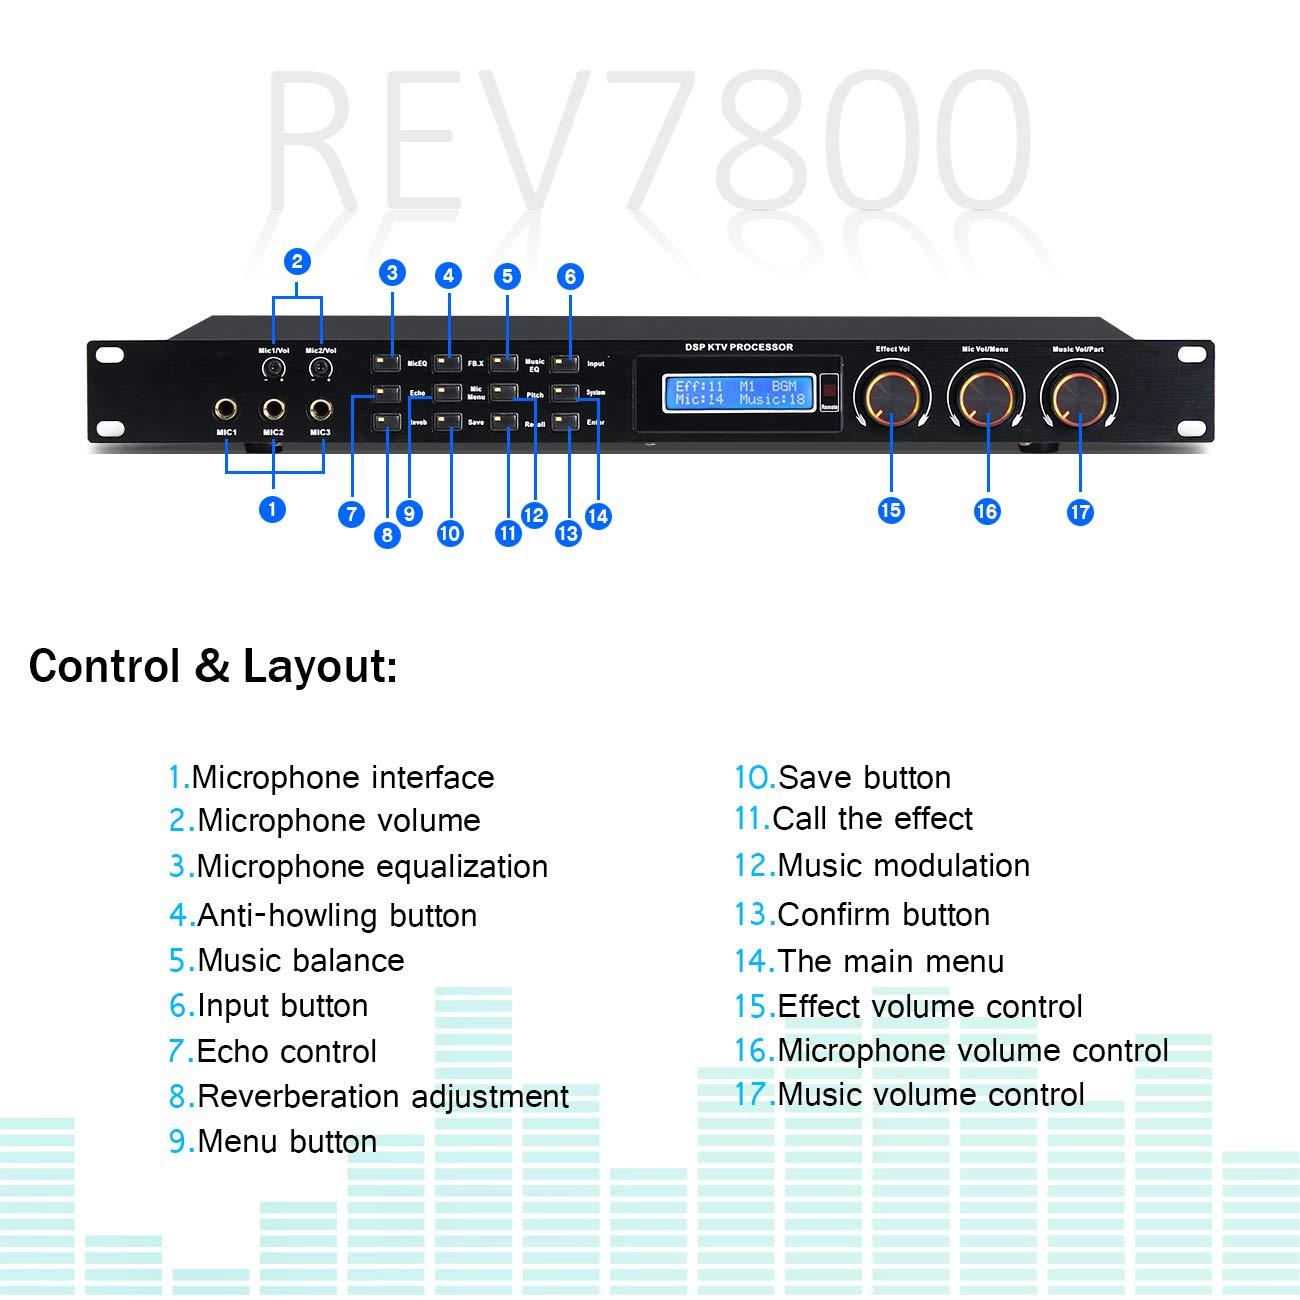 Depusheng REV7800 Karaoke Professional Digital Audio Processor Can Set Via A PC Interface Prevent Howling